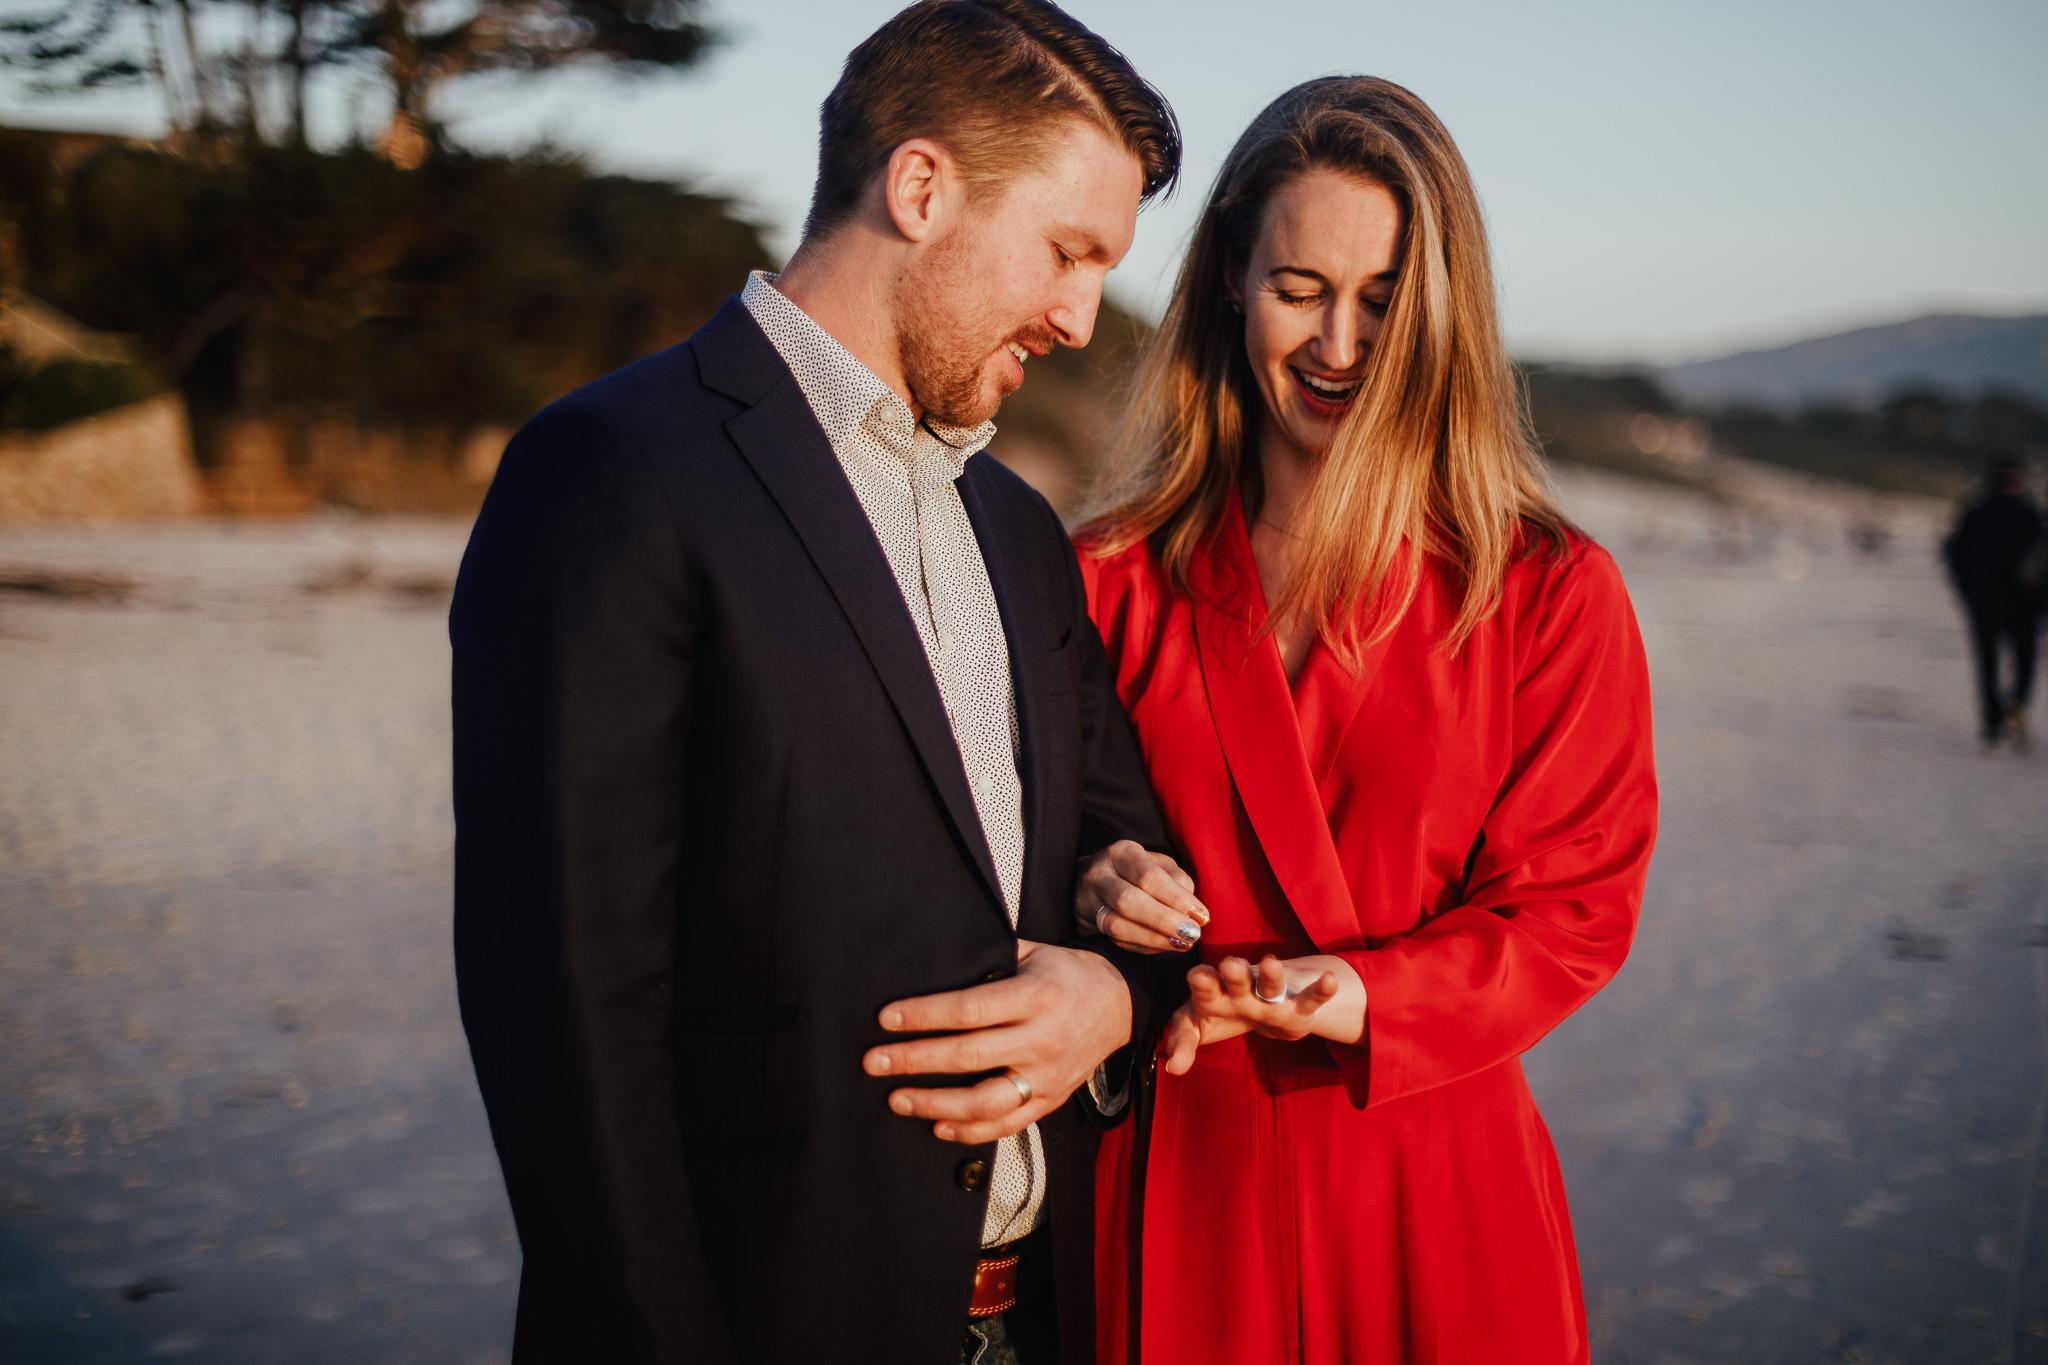 Archer Inspired Photography Carmel Beach California Wedding Engagement Lifestyle Anniversary Natural Light Photographer-76.jpg